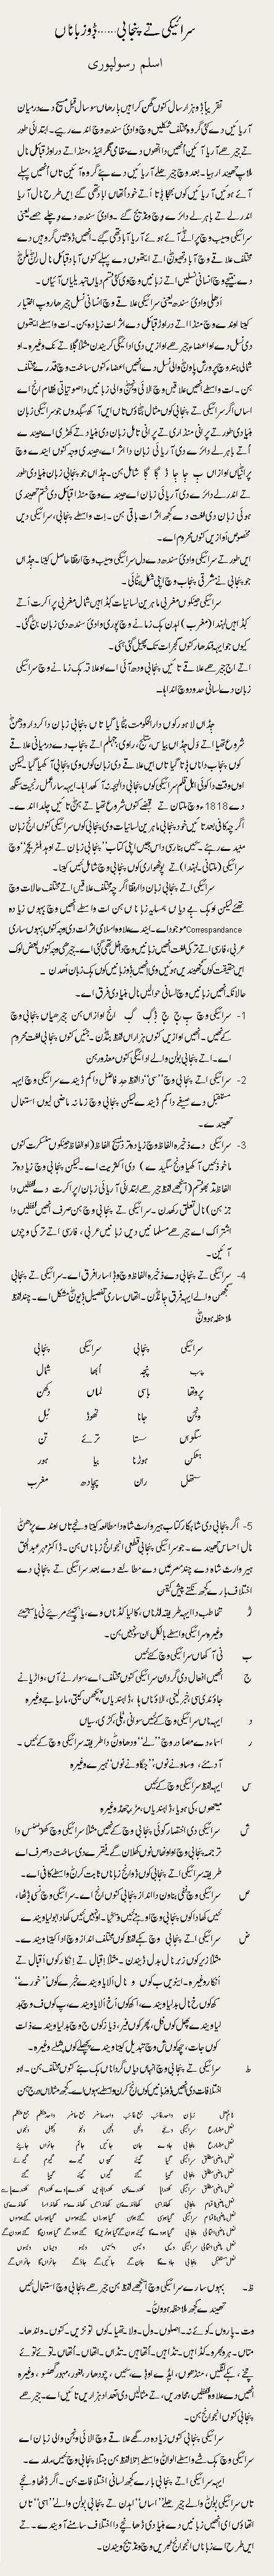 Seraiki Tay Punjabi Dhoon Zubana (Aslam Rasoolpuri)